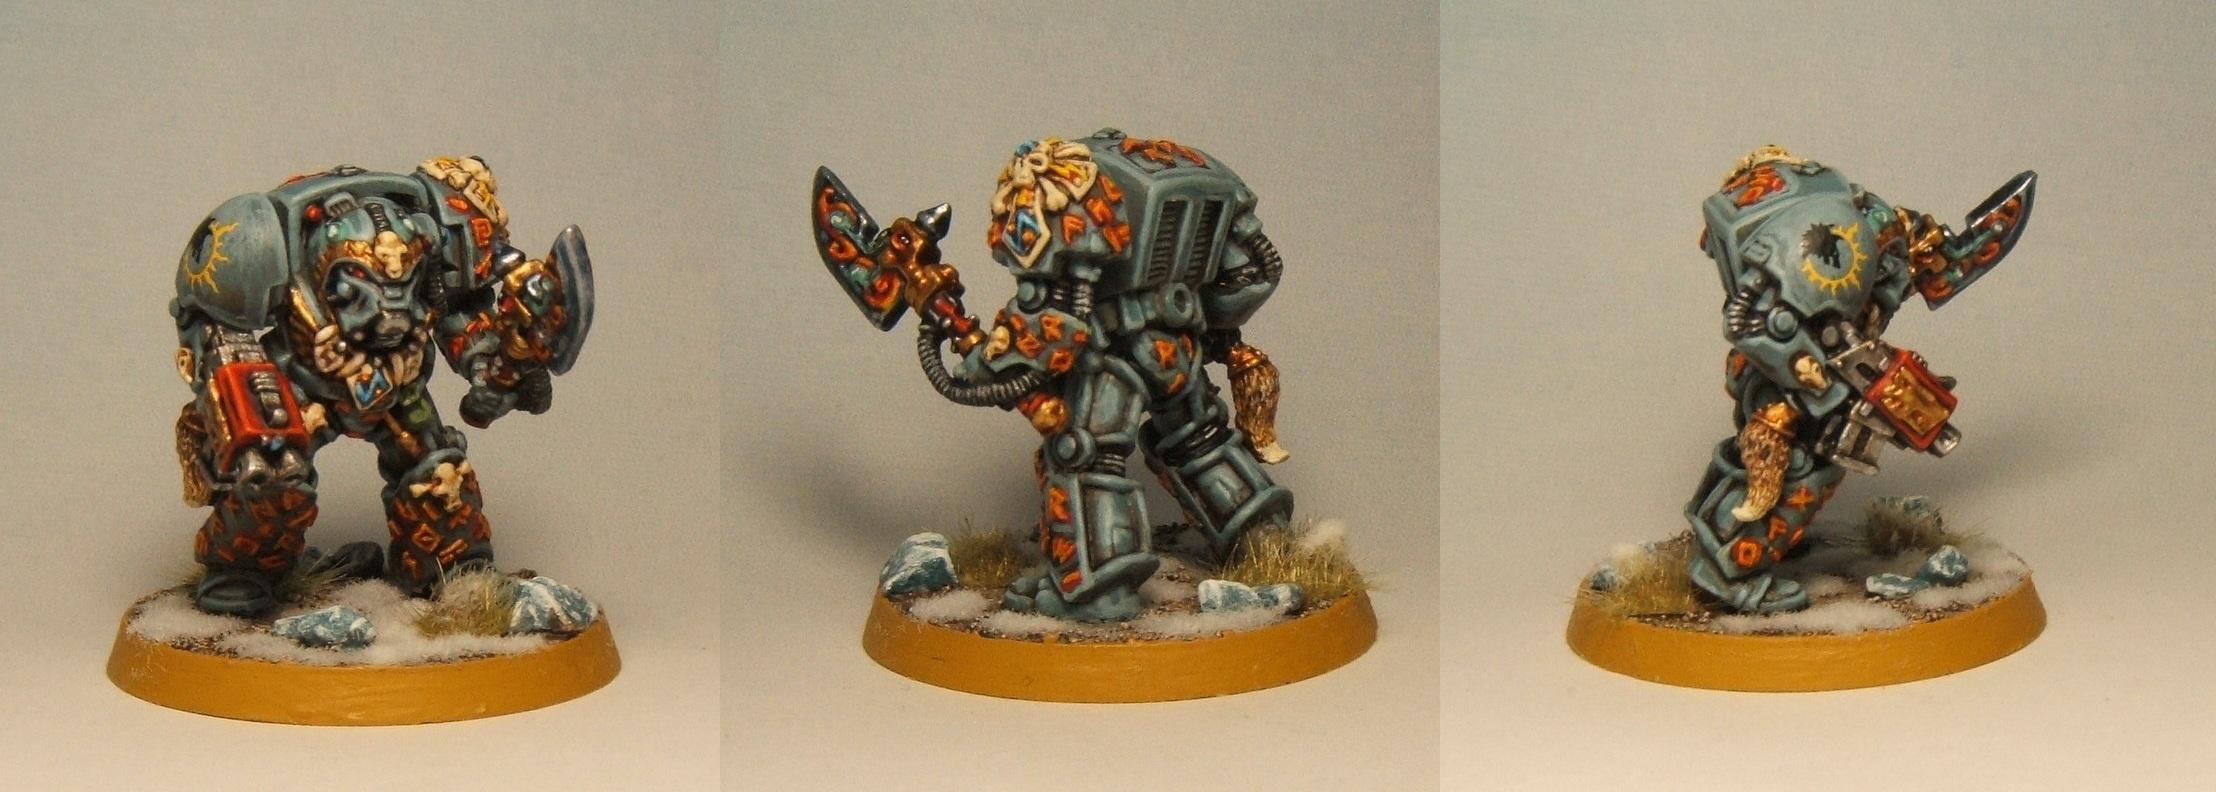 Warhammer et moi! - Page 3 Pretre10